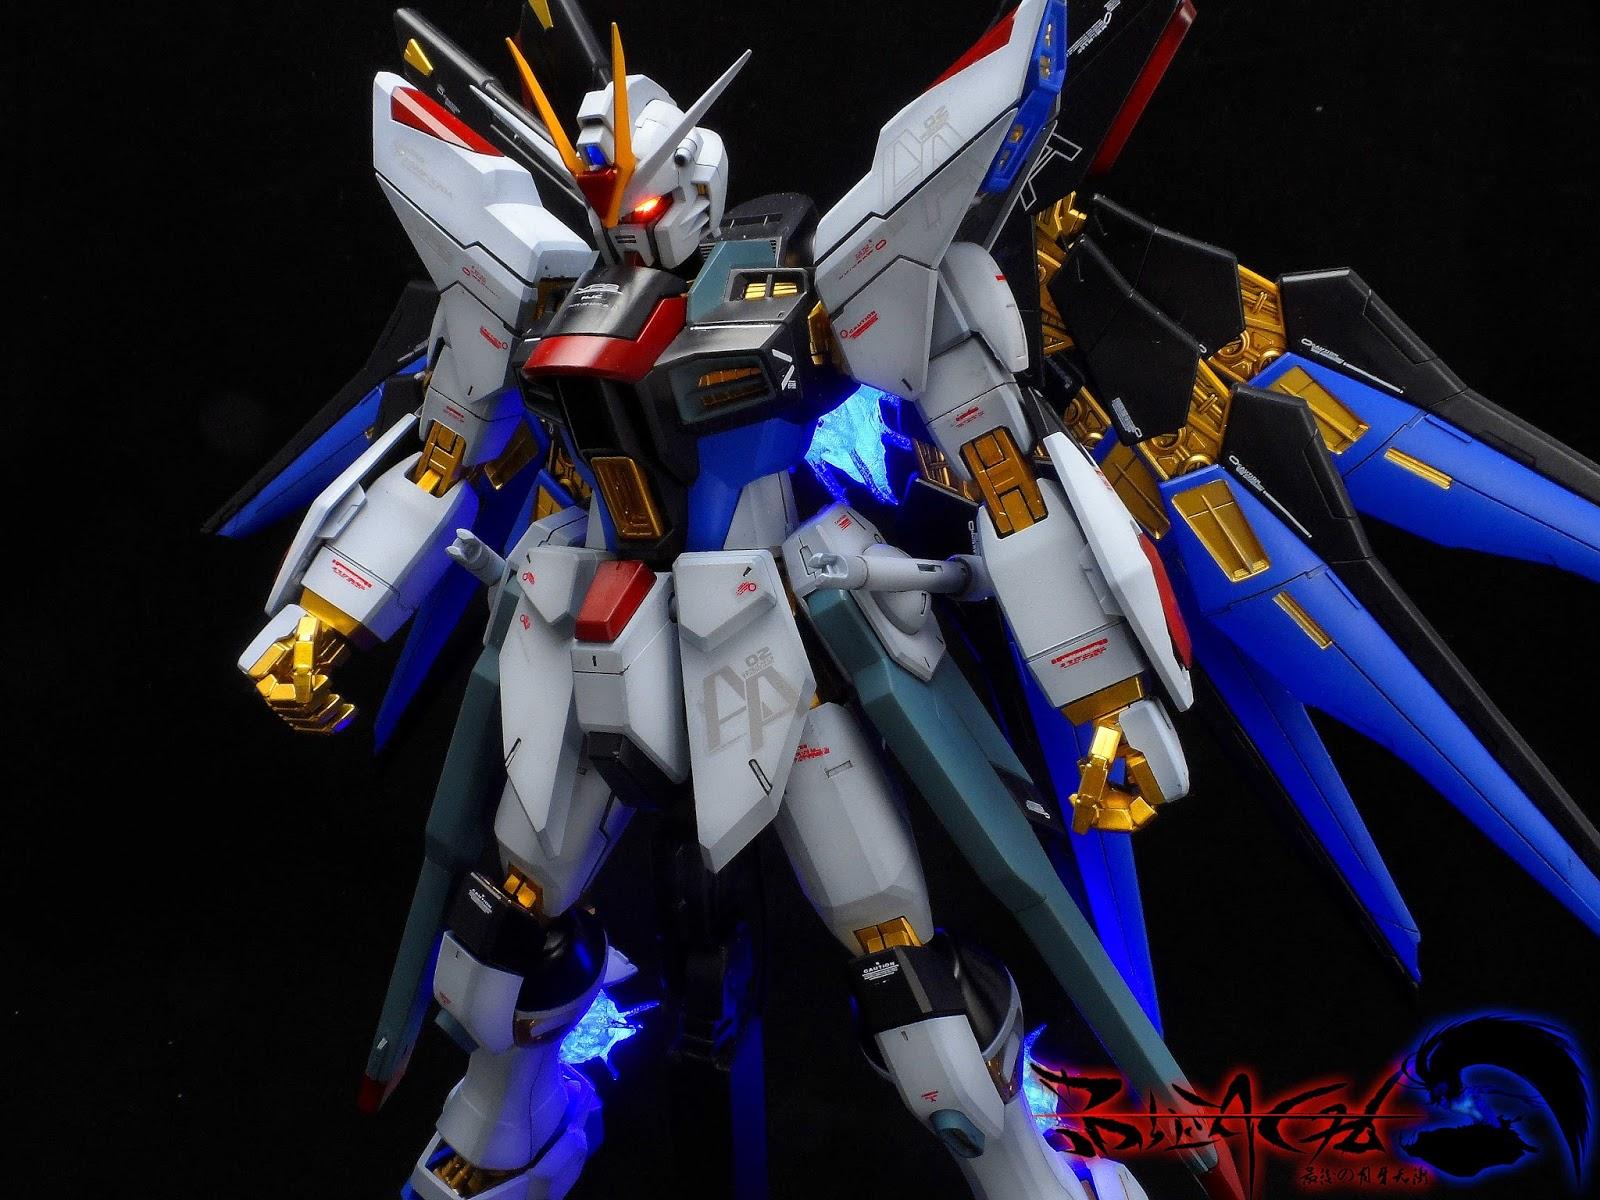 GUNDAM GUY: MG 1/100 Strike Freedom Gundam - Customized ...